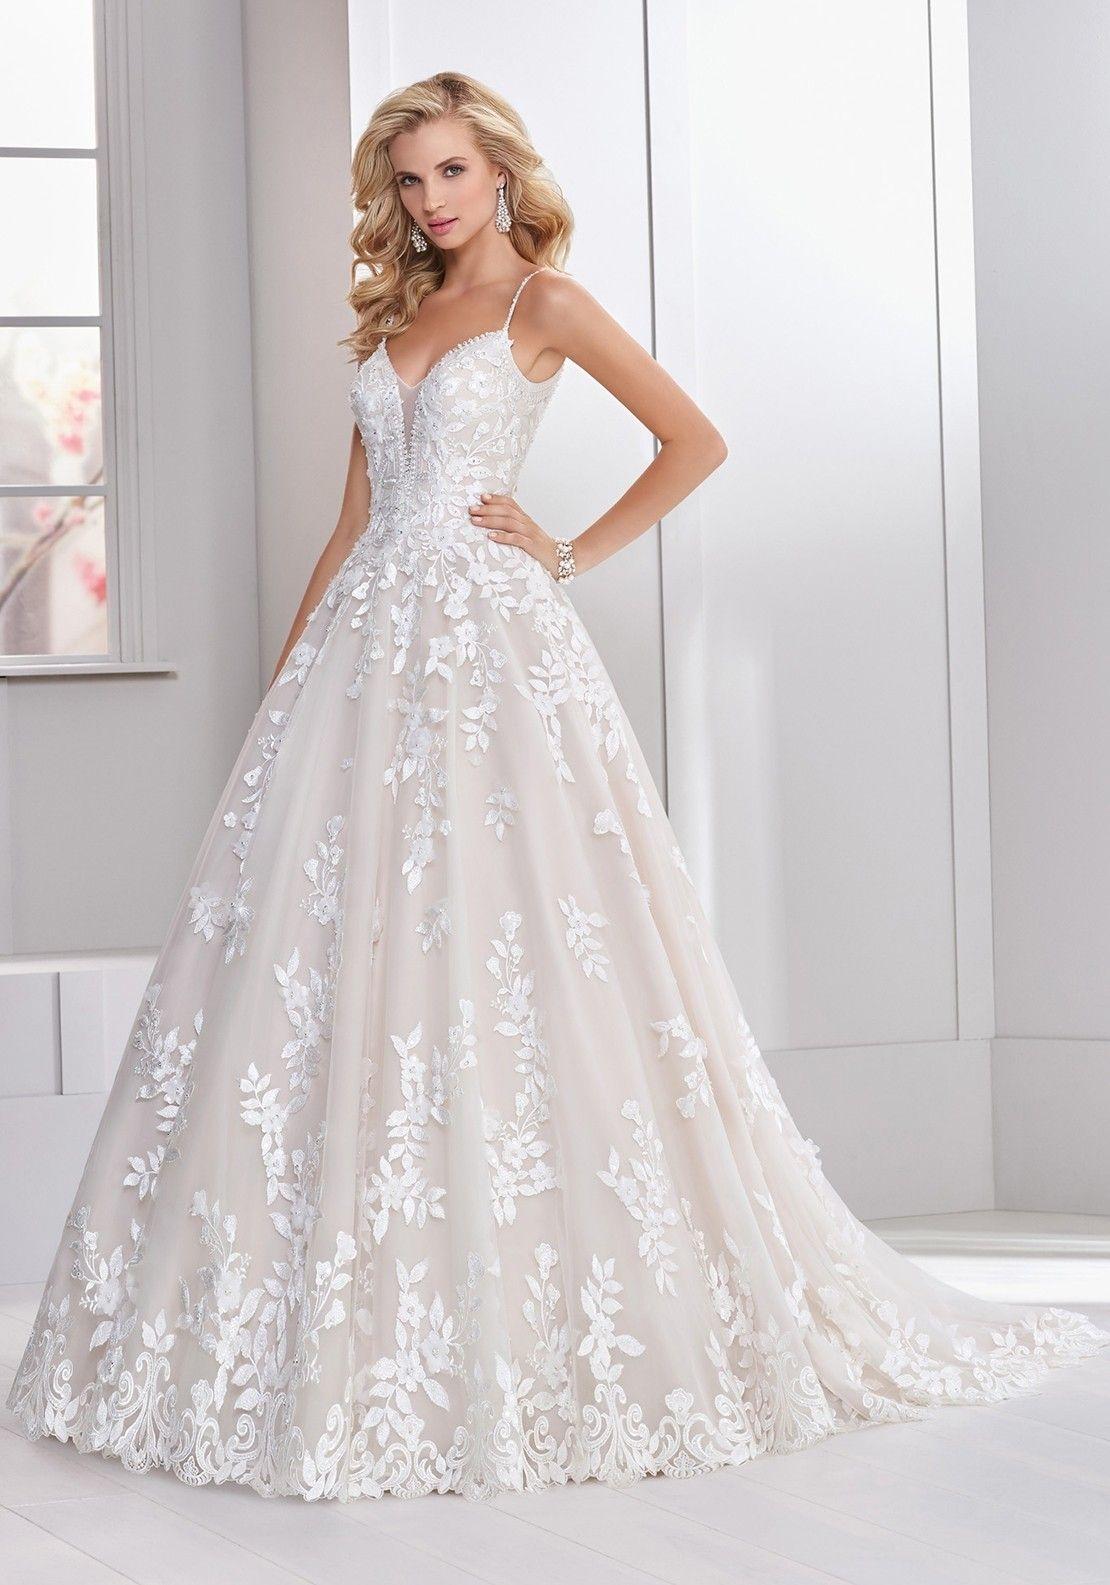 Ronald joyce wedding dress wedding dresses pinterest